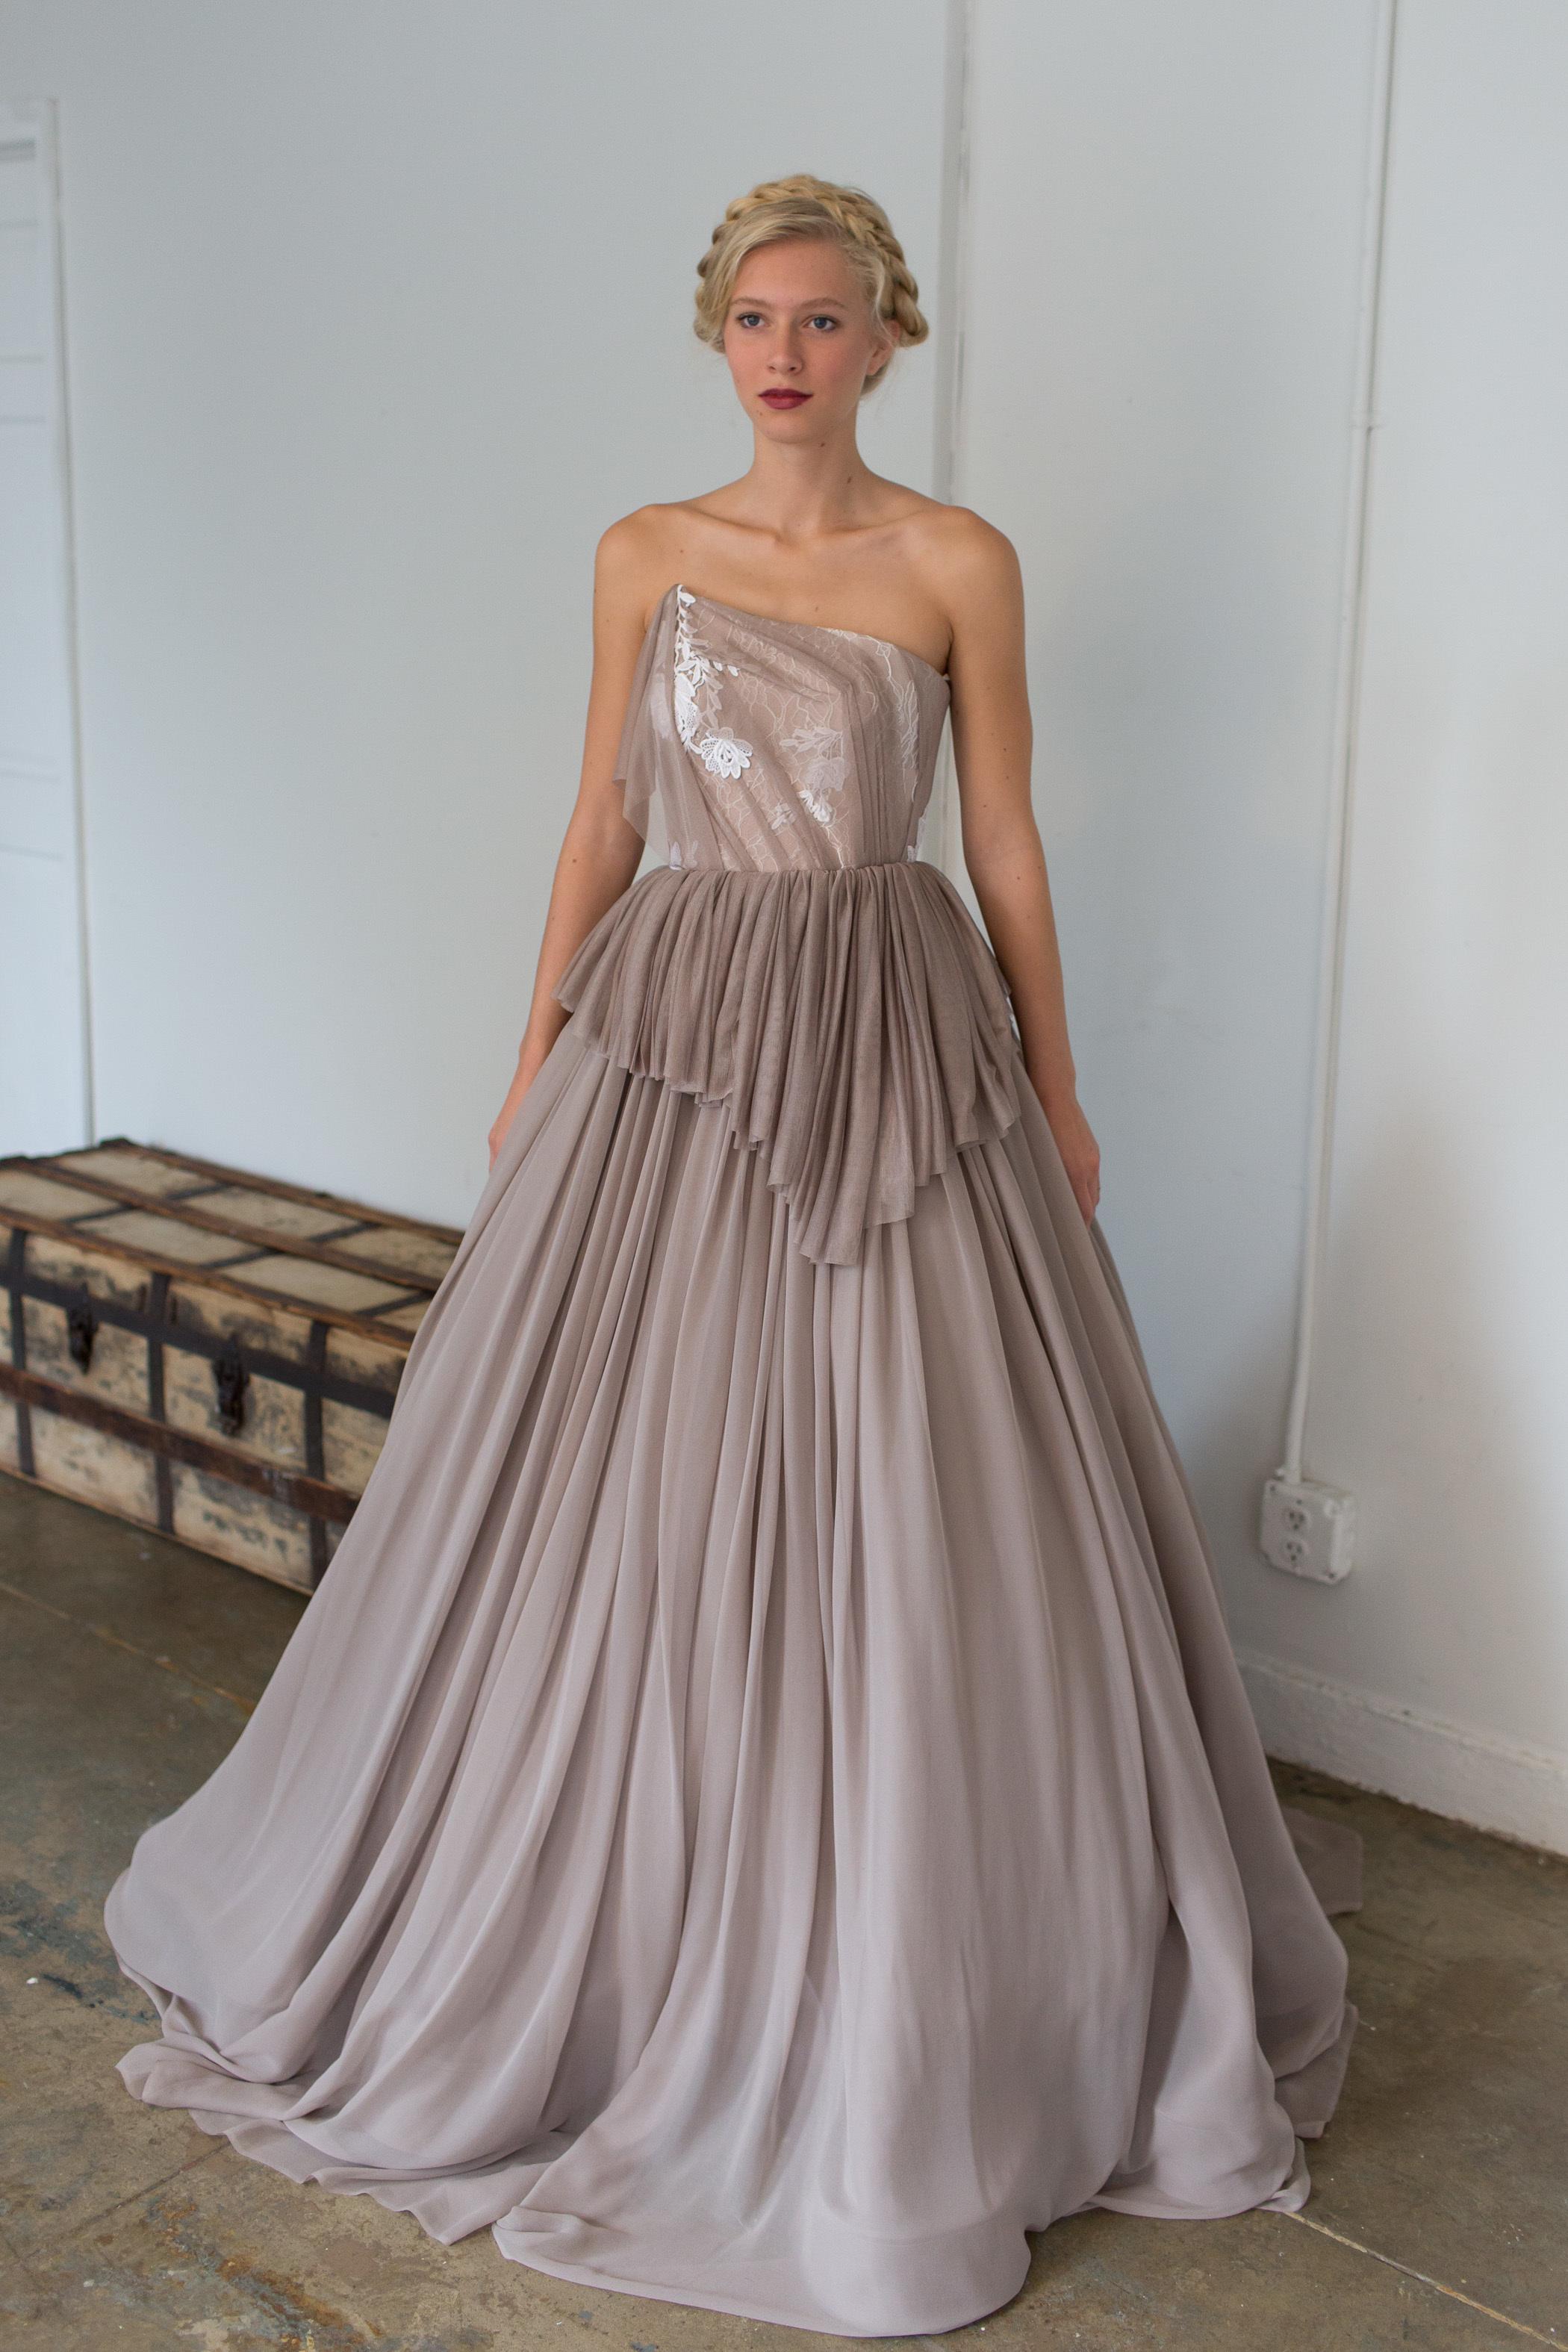 Pippa wedding dress by Tara LaTour